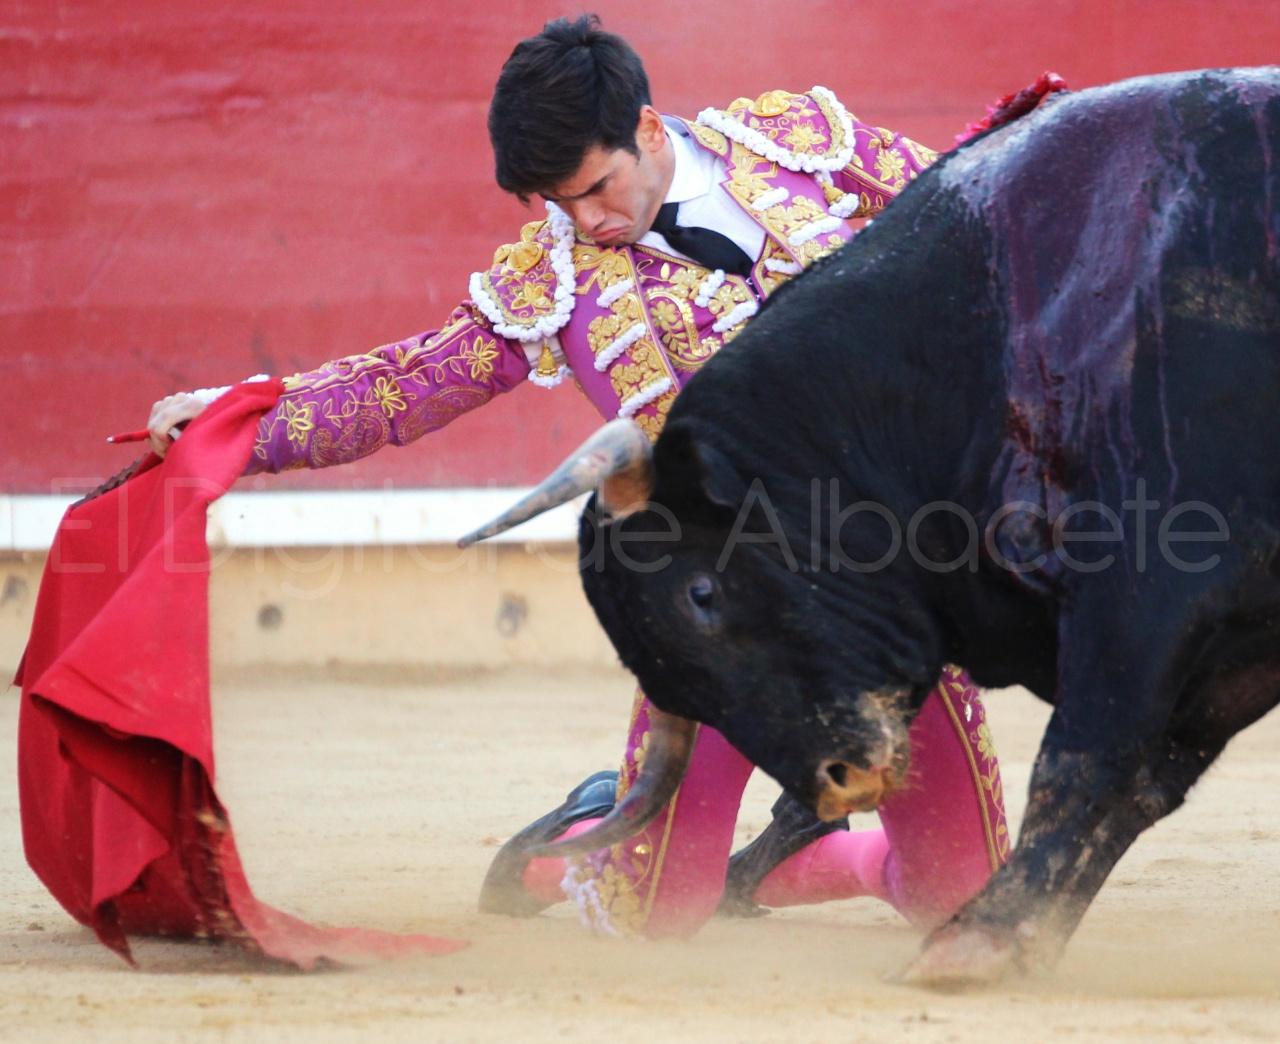 El Juli Lopez Simon y Garrido Feria Albacete 2015 toros  66